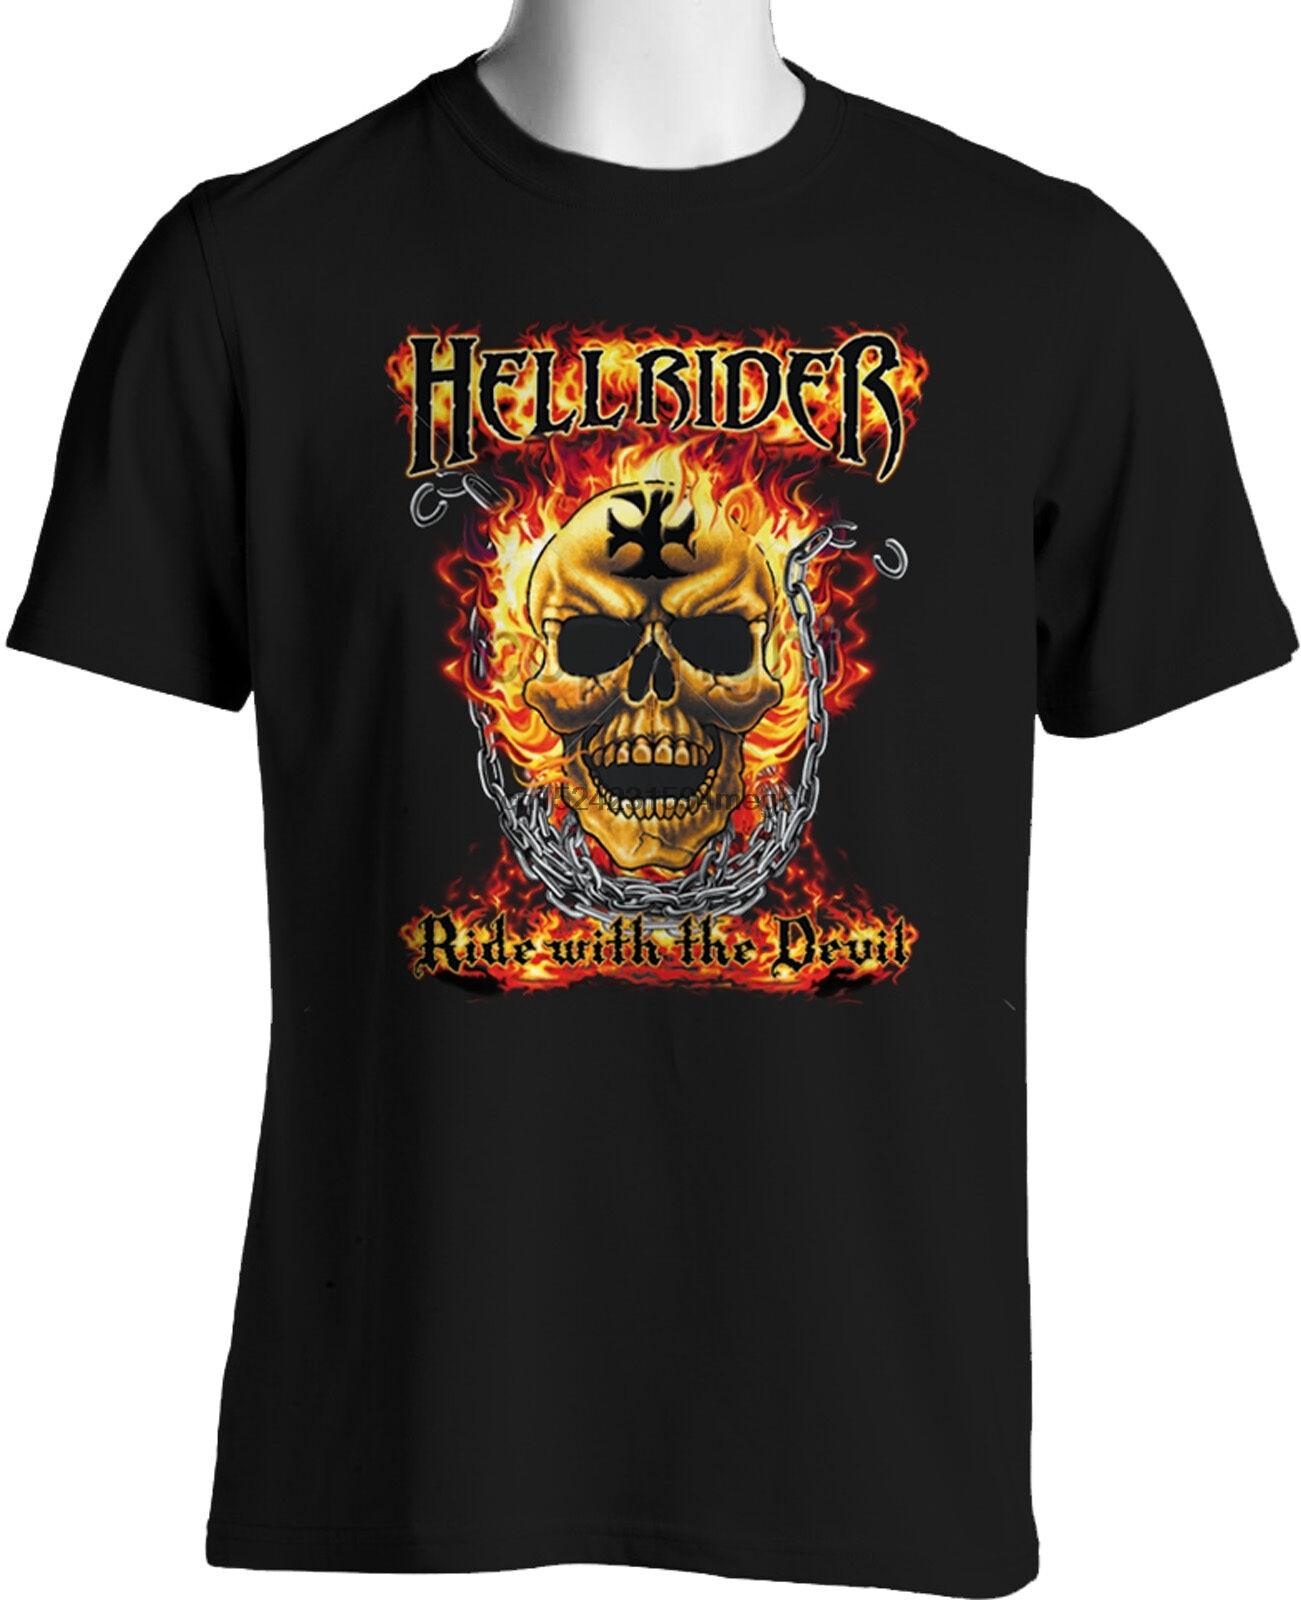 Heavy Metal Flaming Skull Biker T-shirt Hell Ride with Devil Mens Black T-Shirt